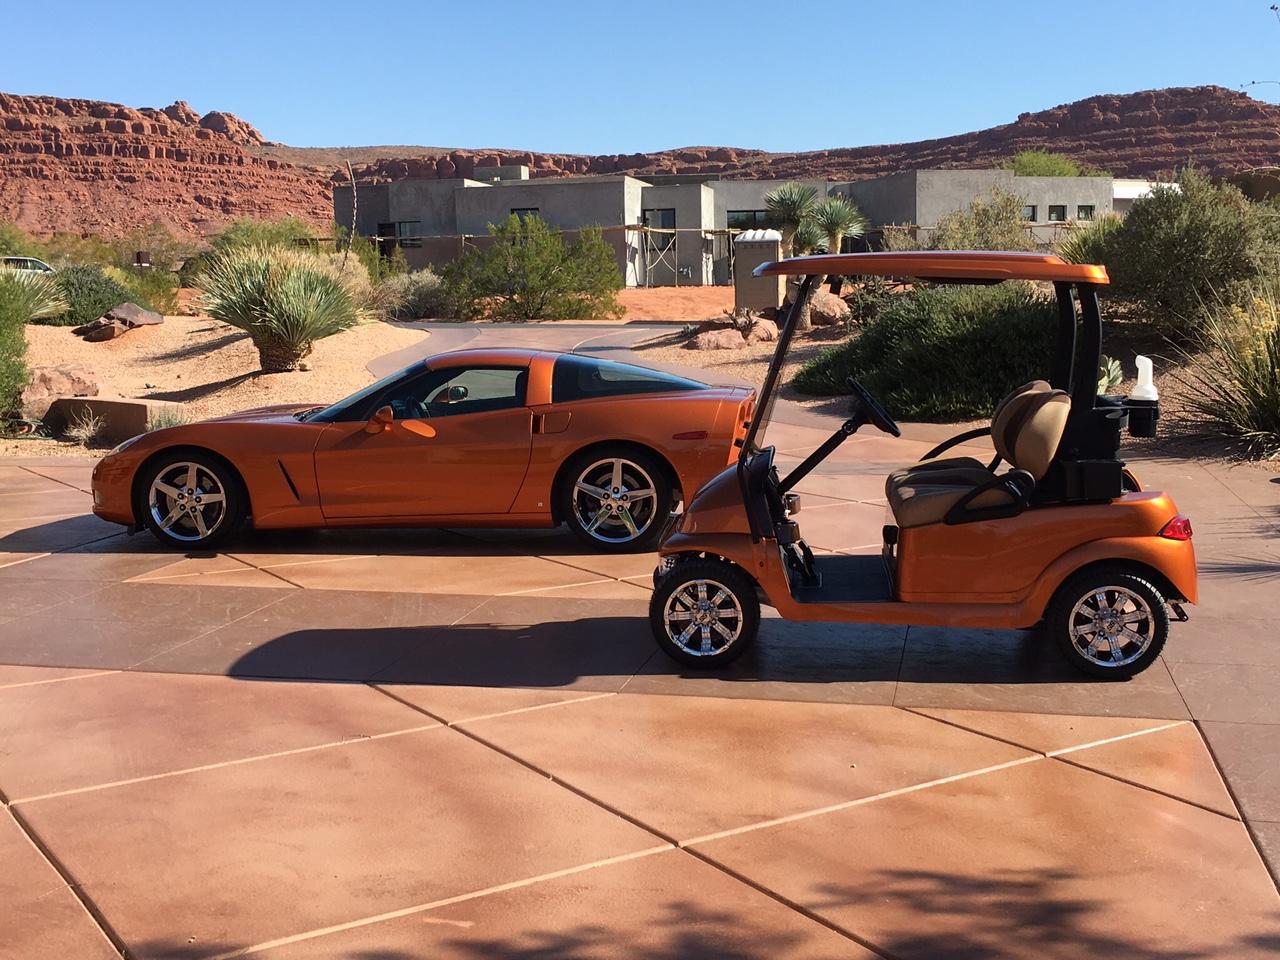 Corvette matches golf car